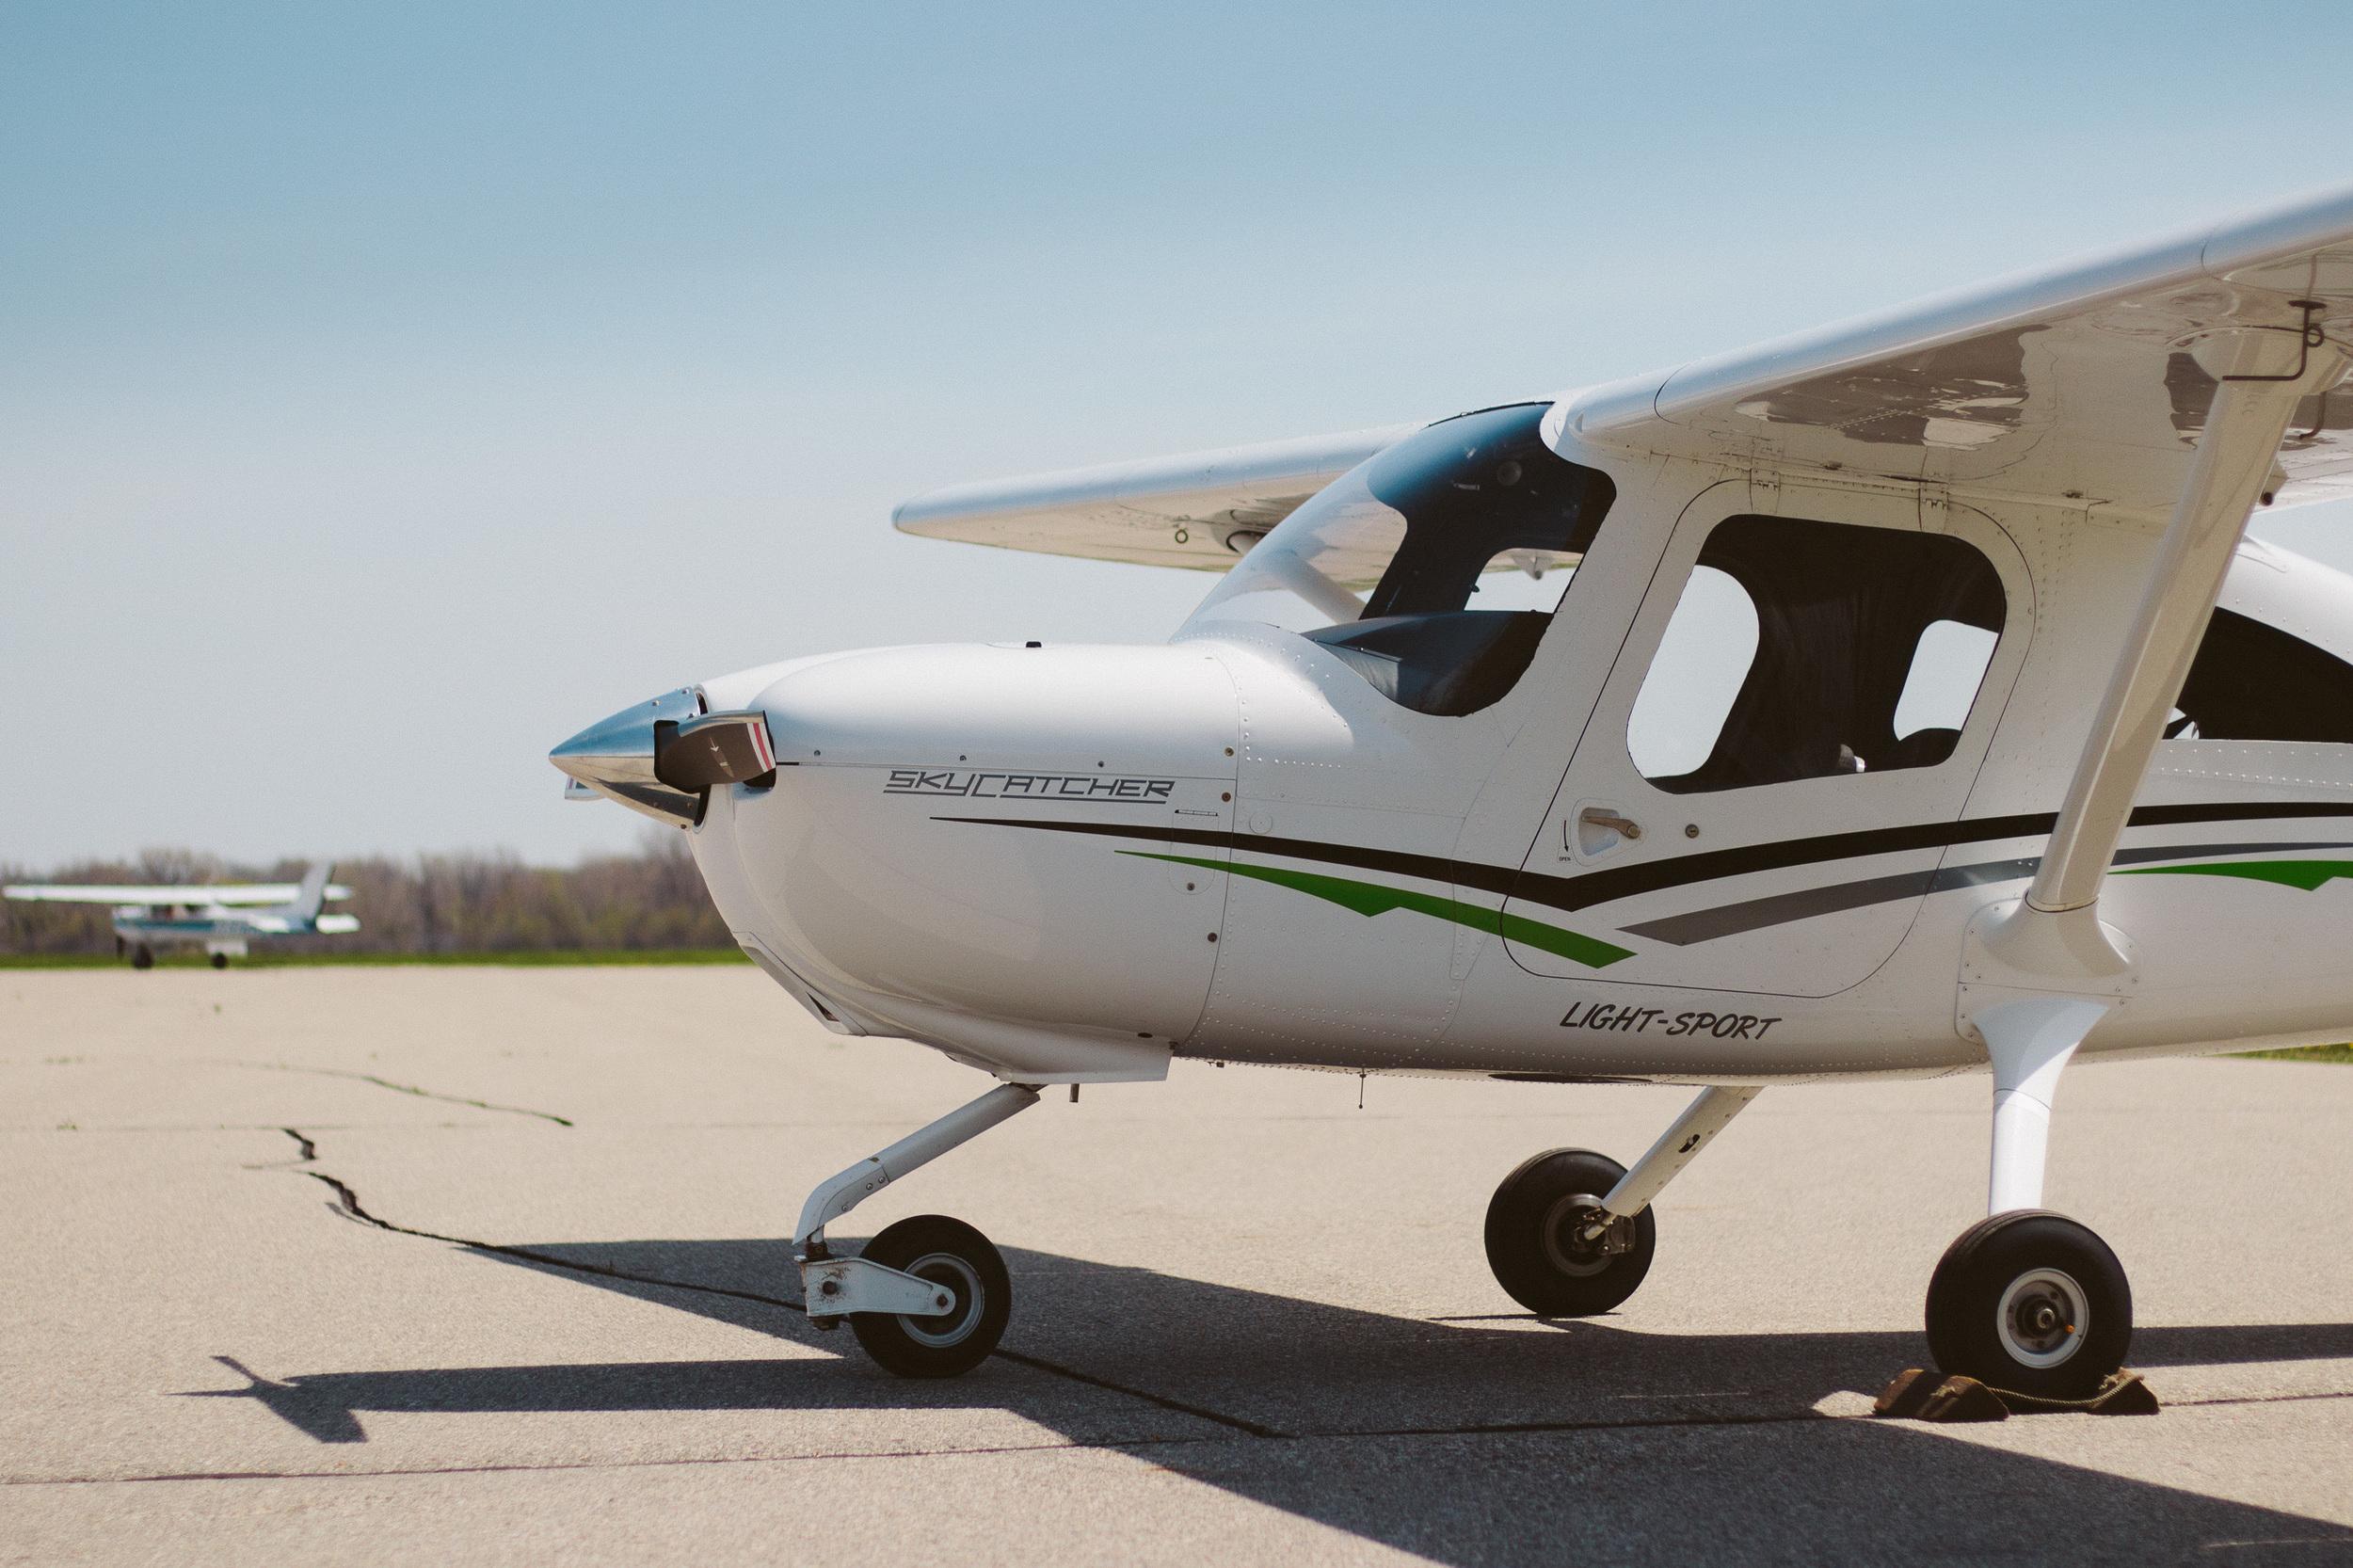 Michigan Flyers Skycatcher for sale